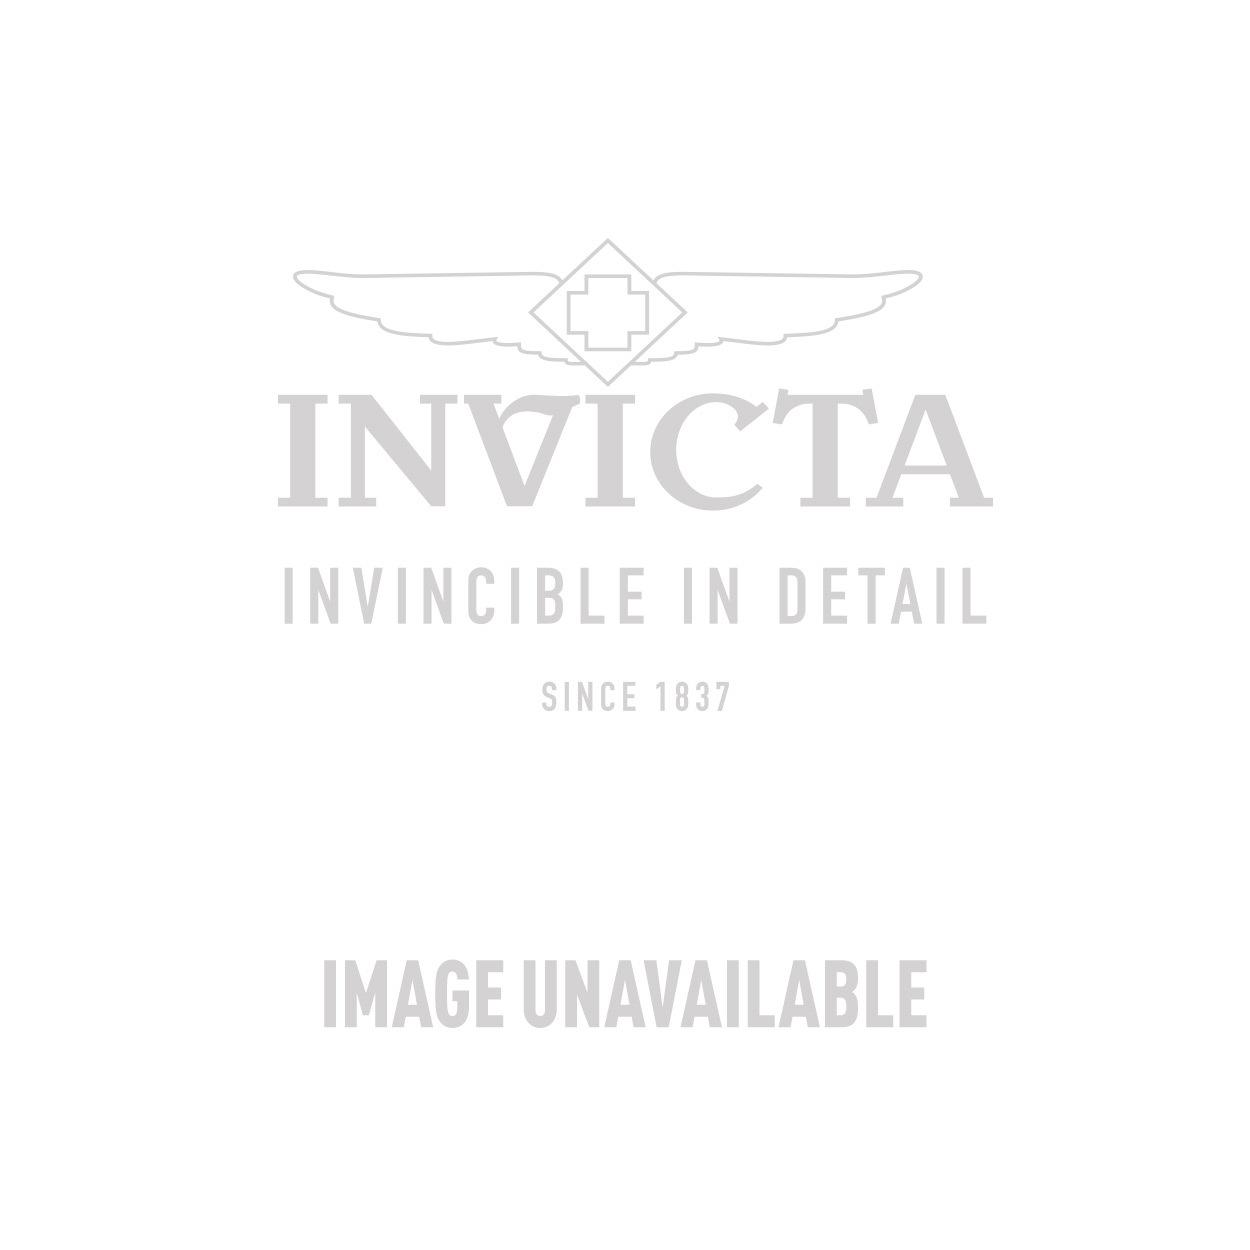 Invicta Speedway Men's Quartz 39.5mm Gold, Gunmetal Case Gold Dial - Model 90182